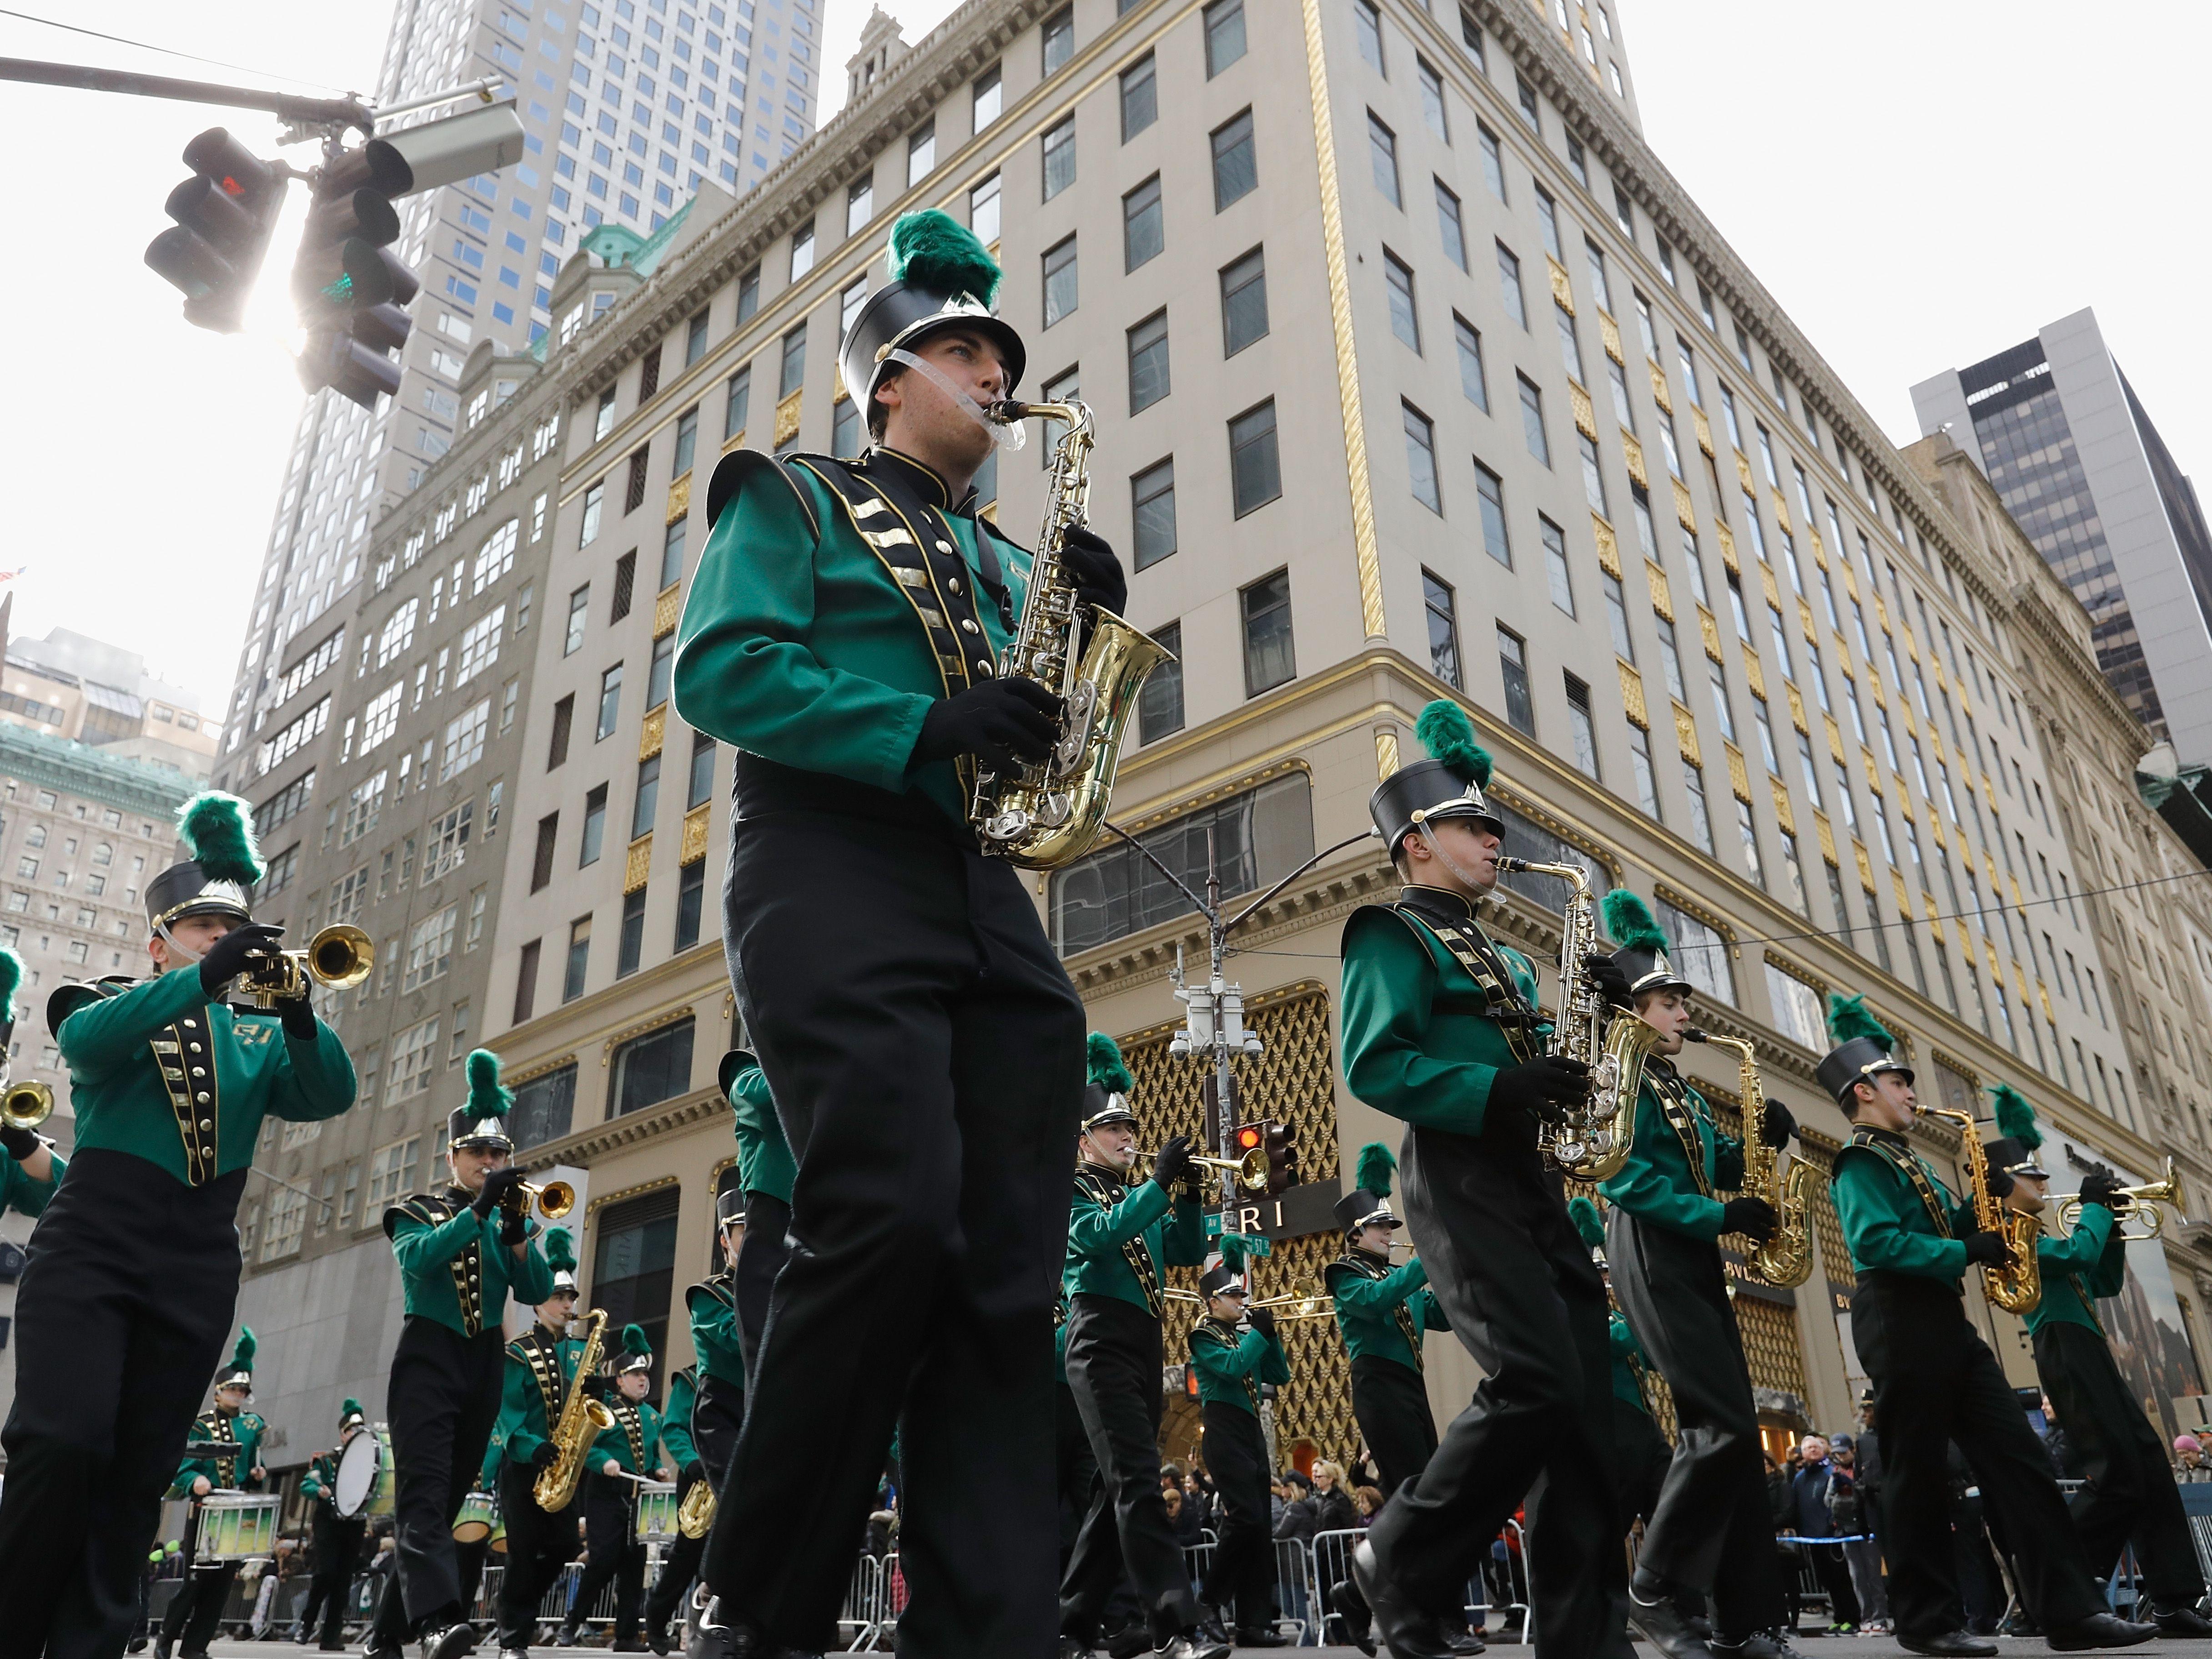 a5f822b97 5 Fun Things to Do for St. Patrick's Day in NYC